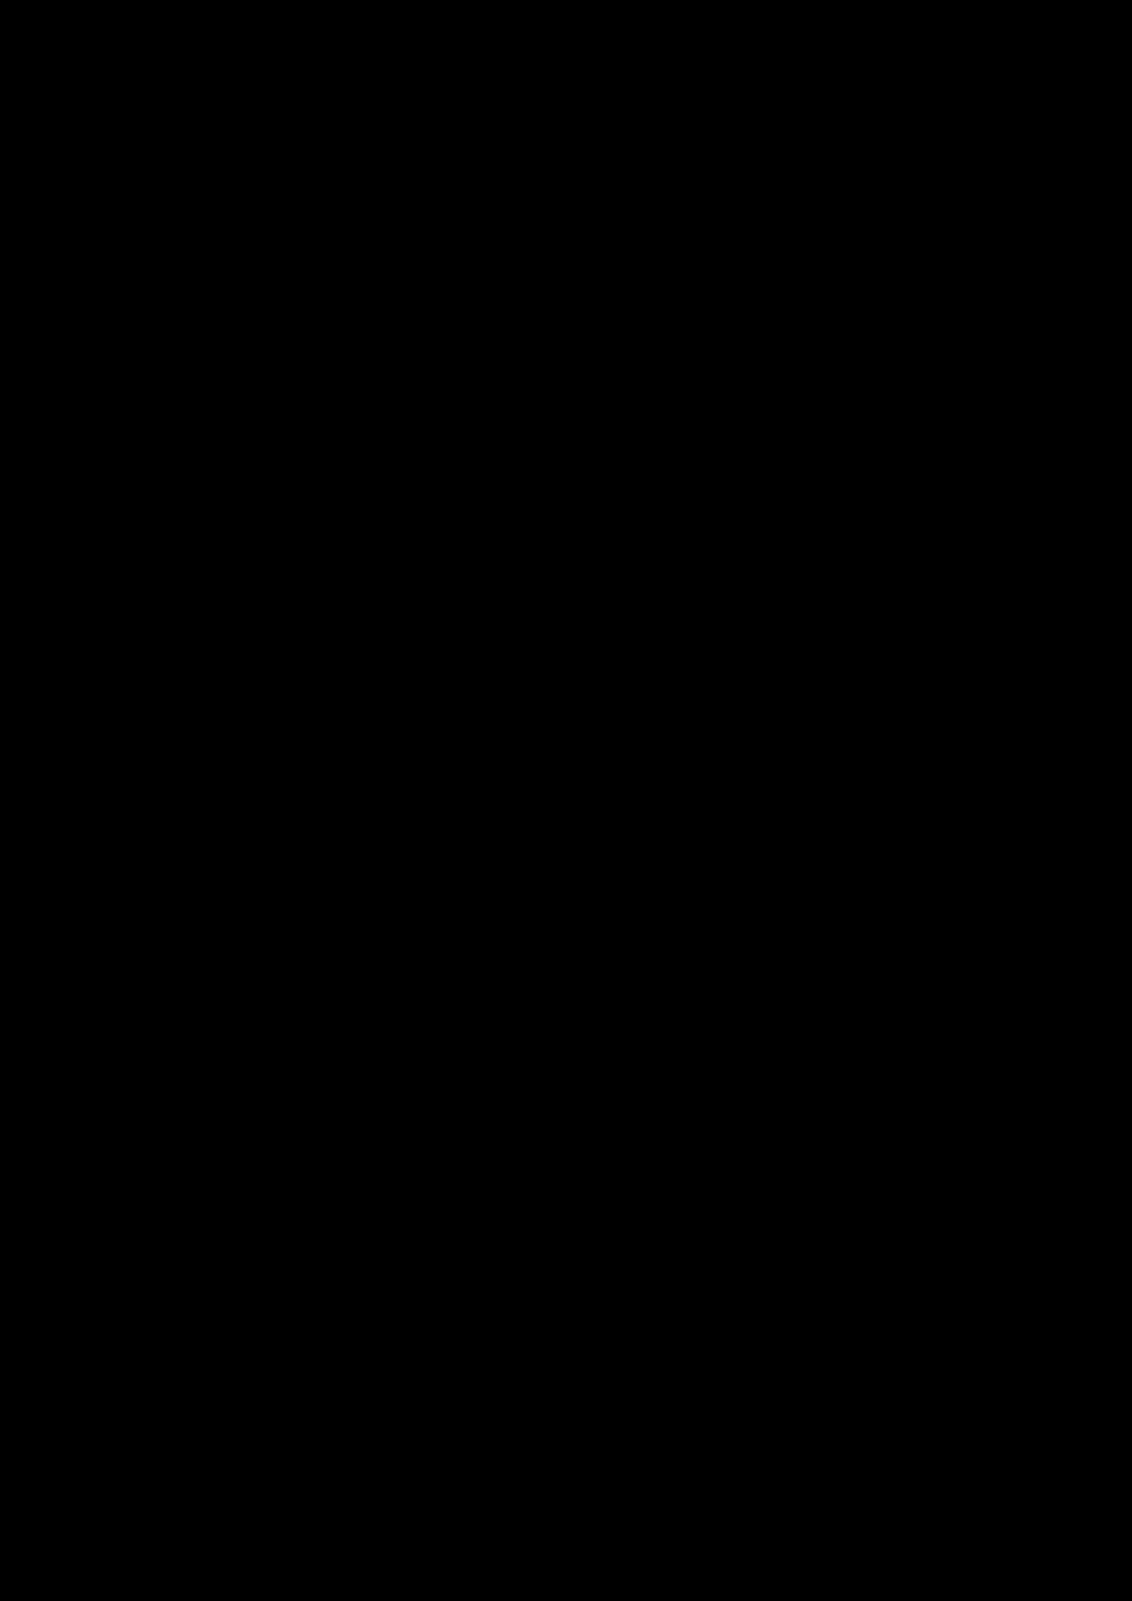 Belyiy sokol slide, Image 165